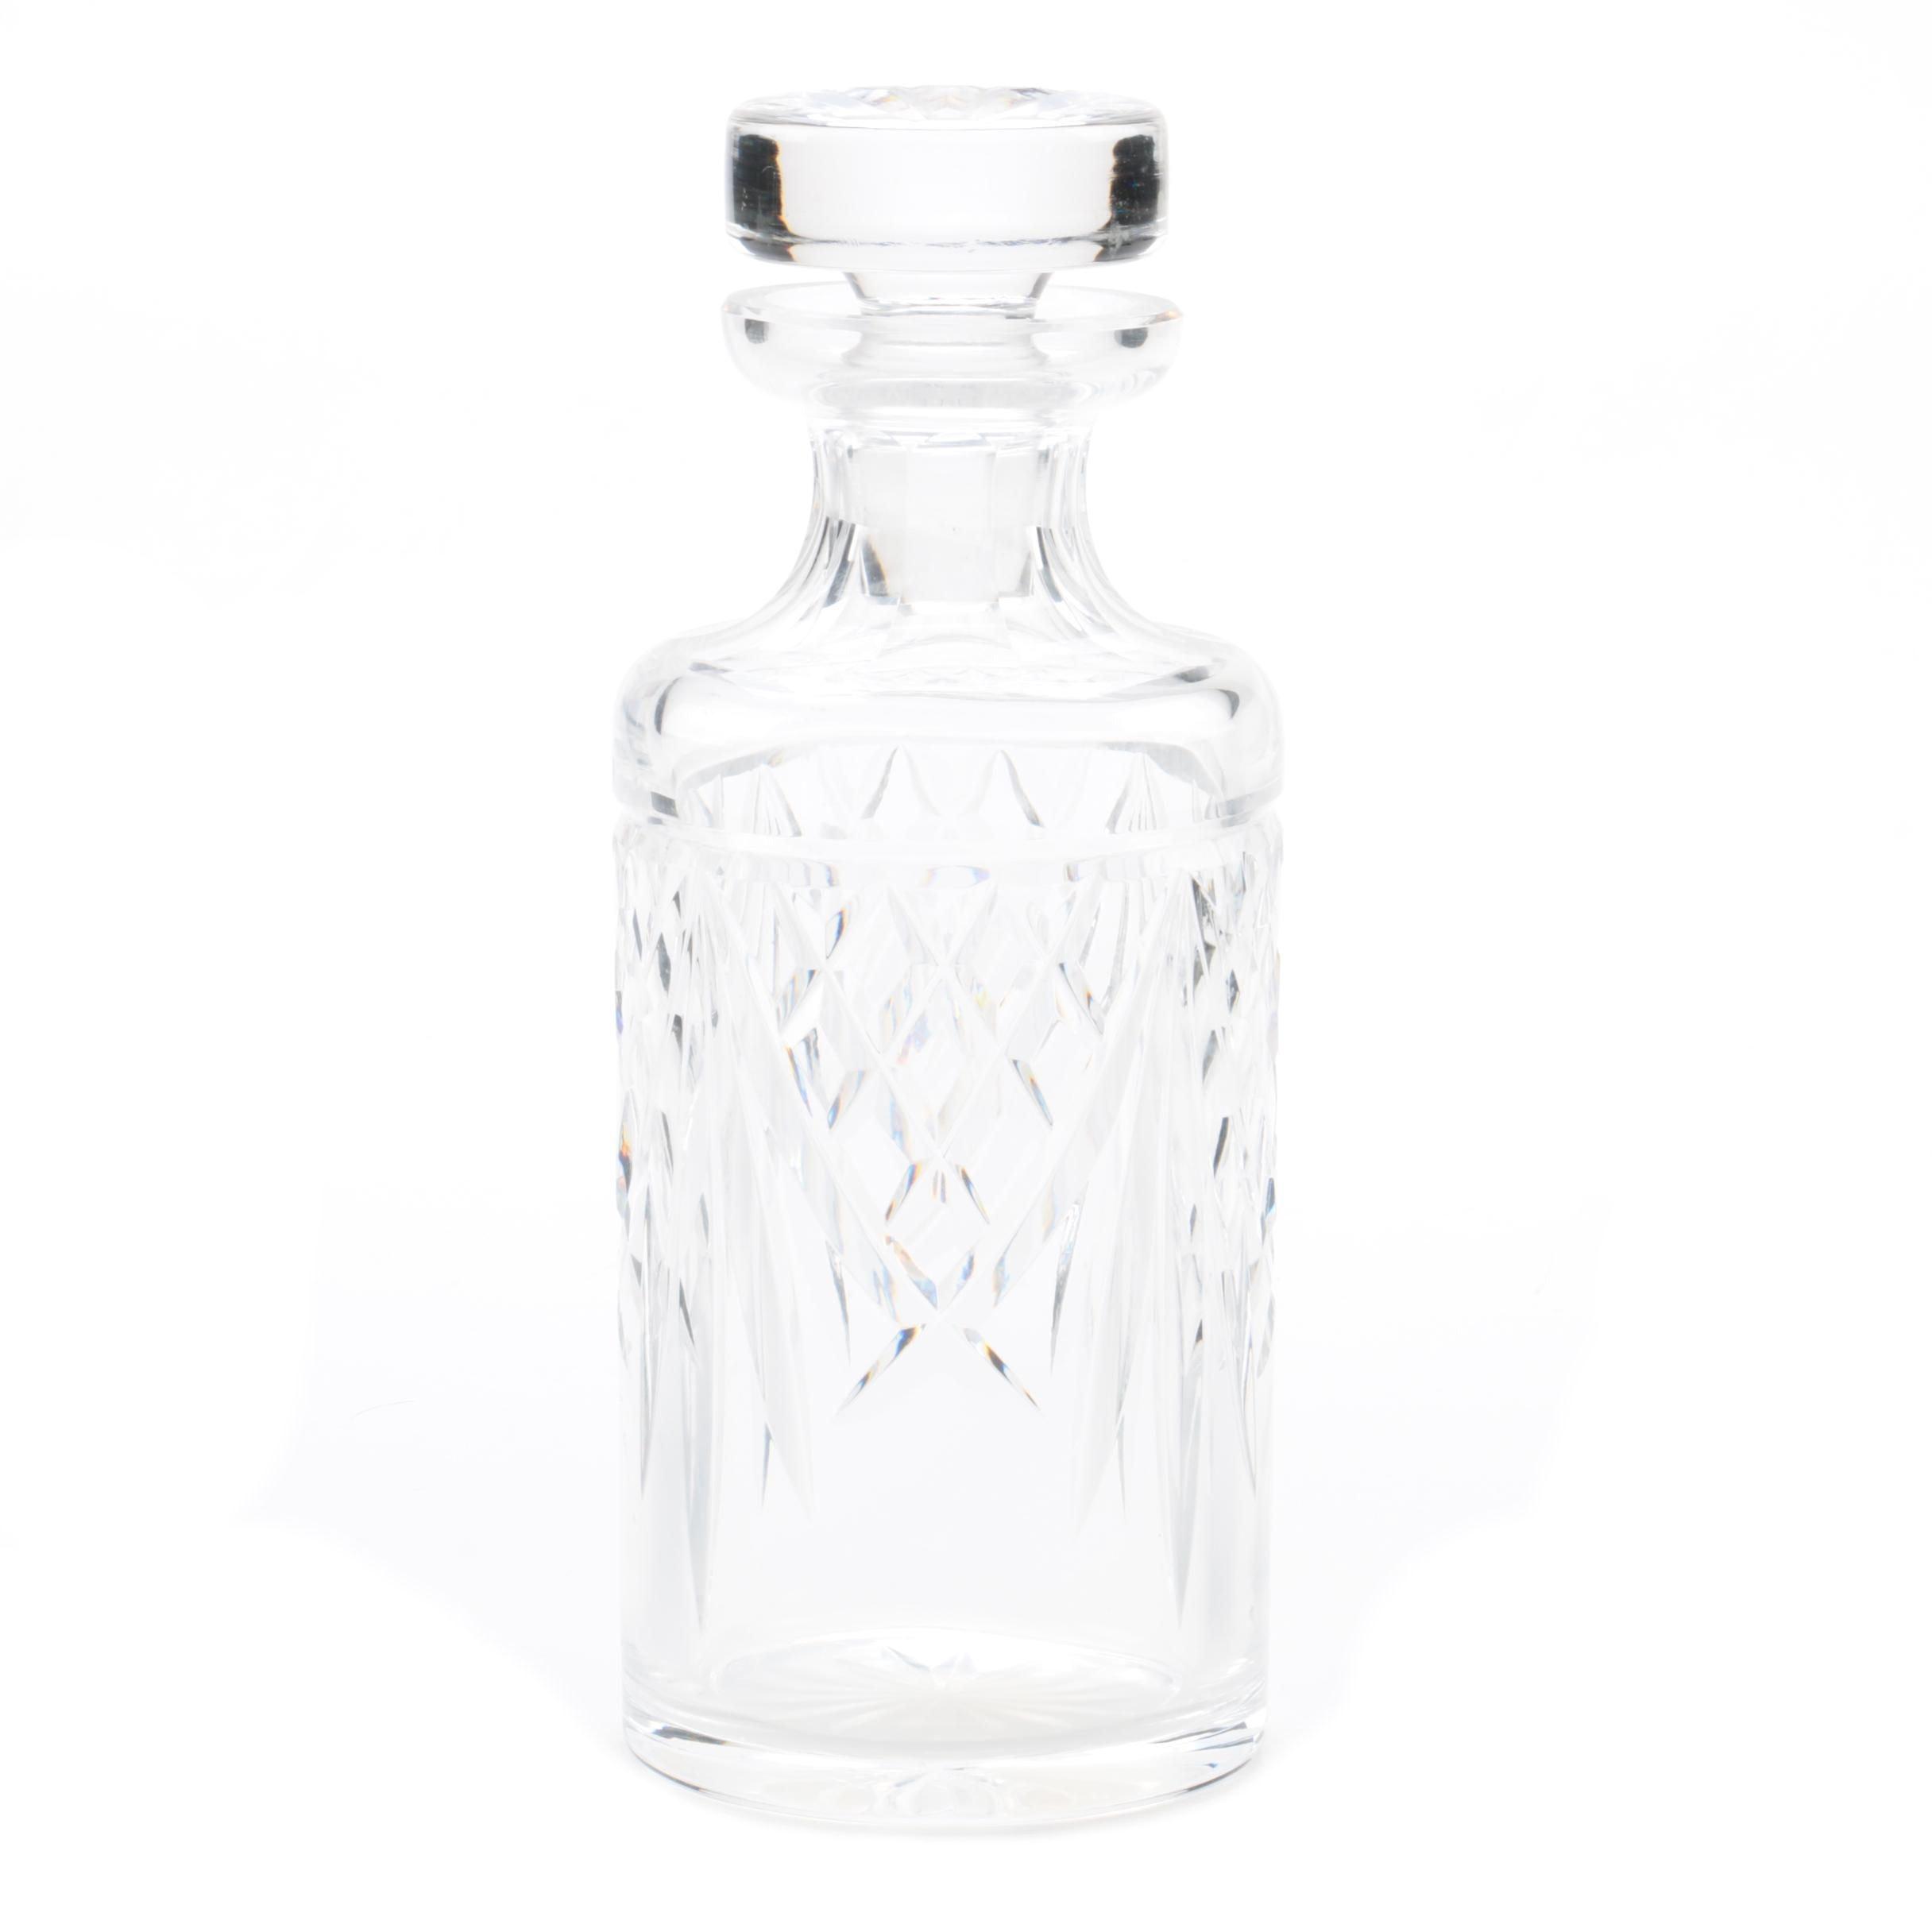 Waterford Crystal Spirit Decanter